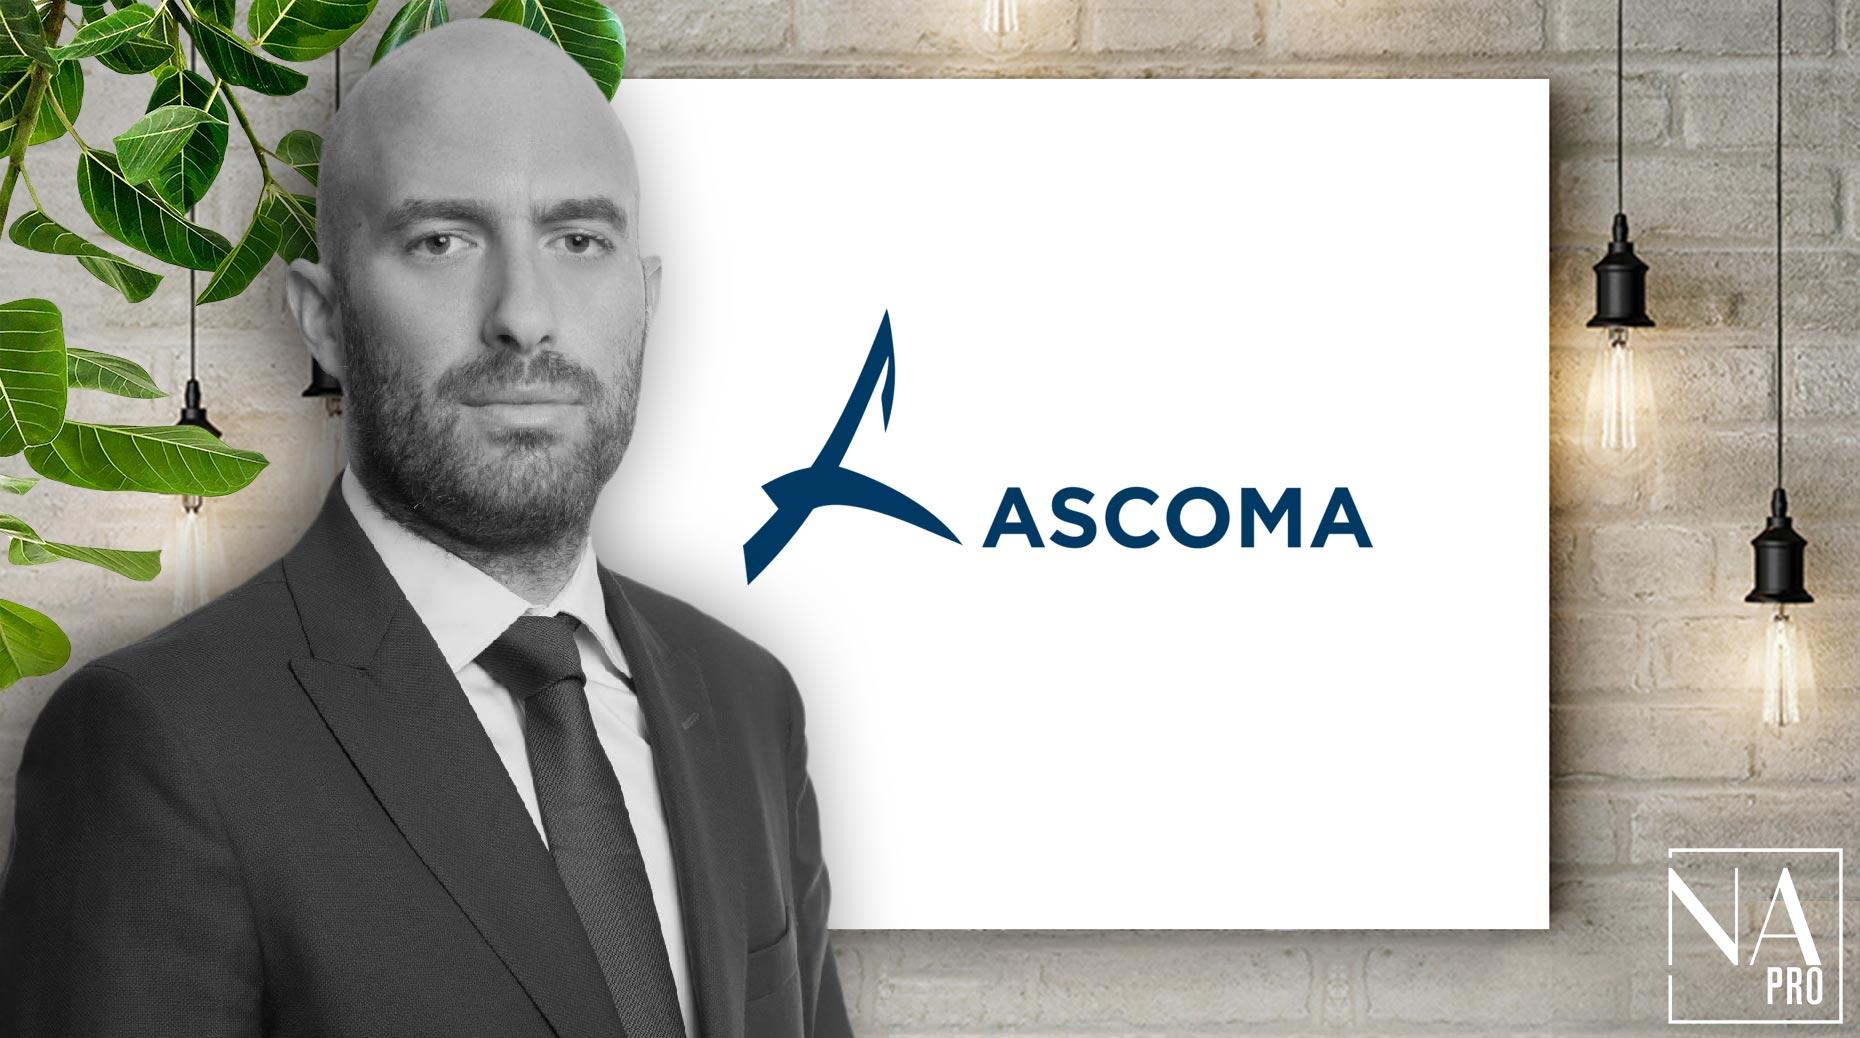 Michel Schoucair Ascoma